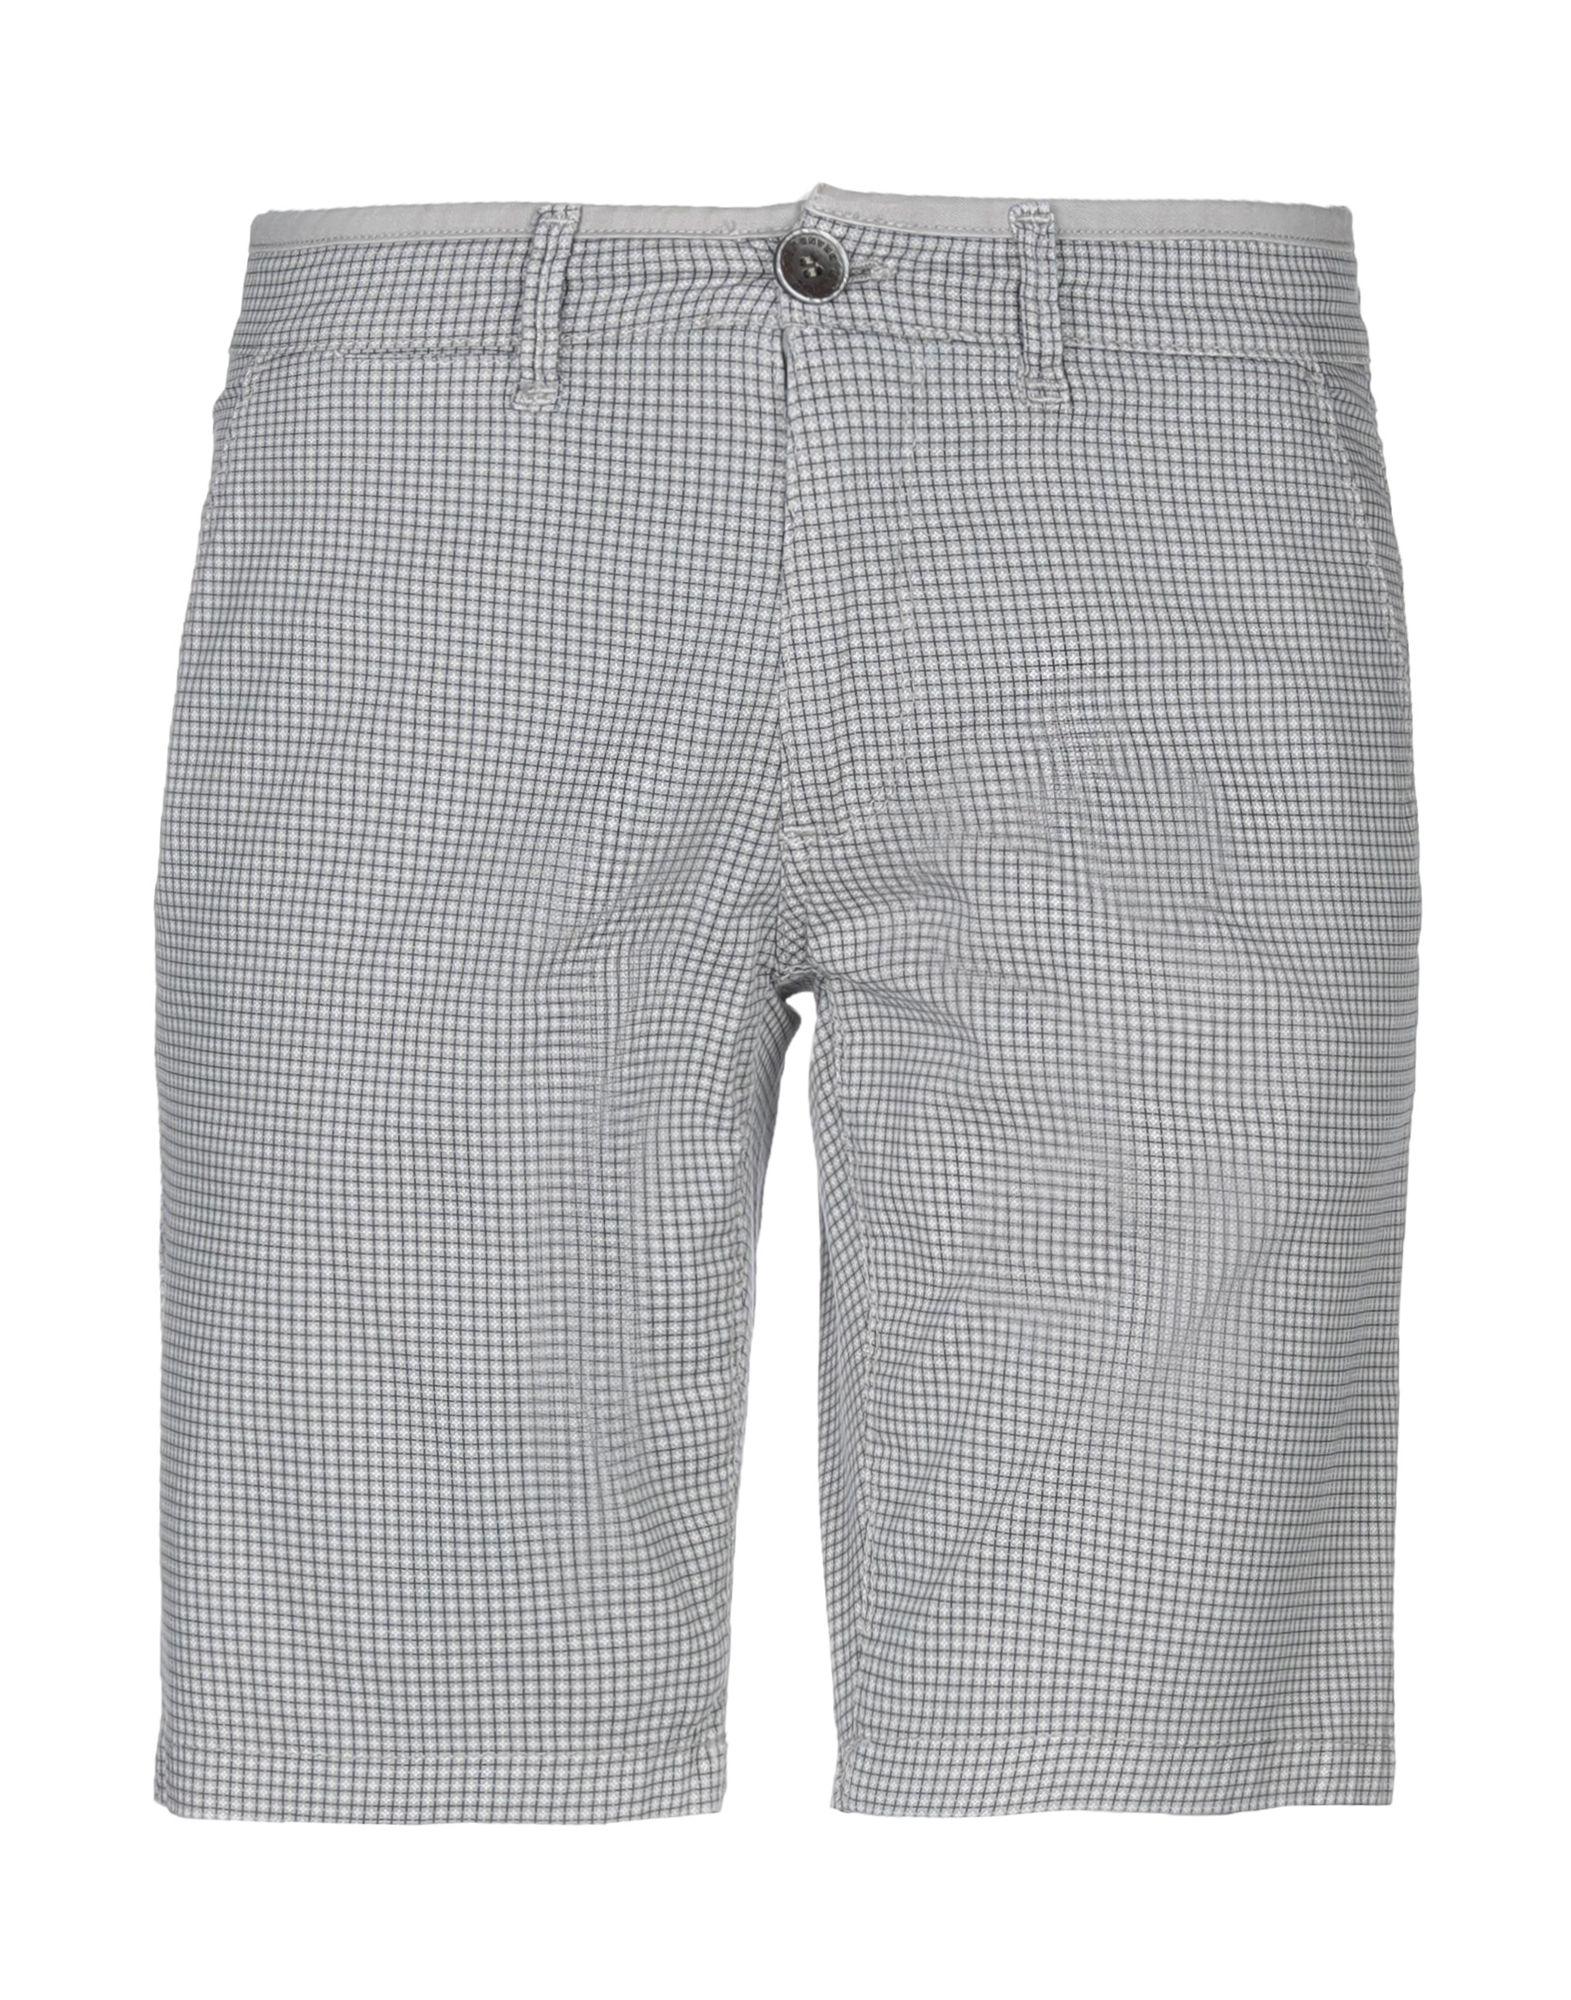 Shorts & Bermuda Enjoy Brand+Jeans uomo - 13228226OW 13228226OW 13228226OW c29